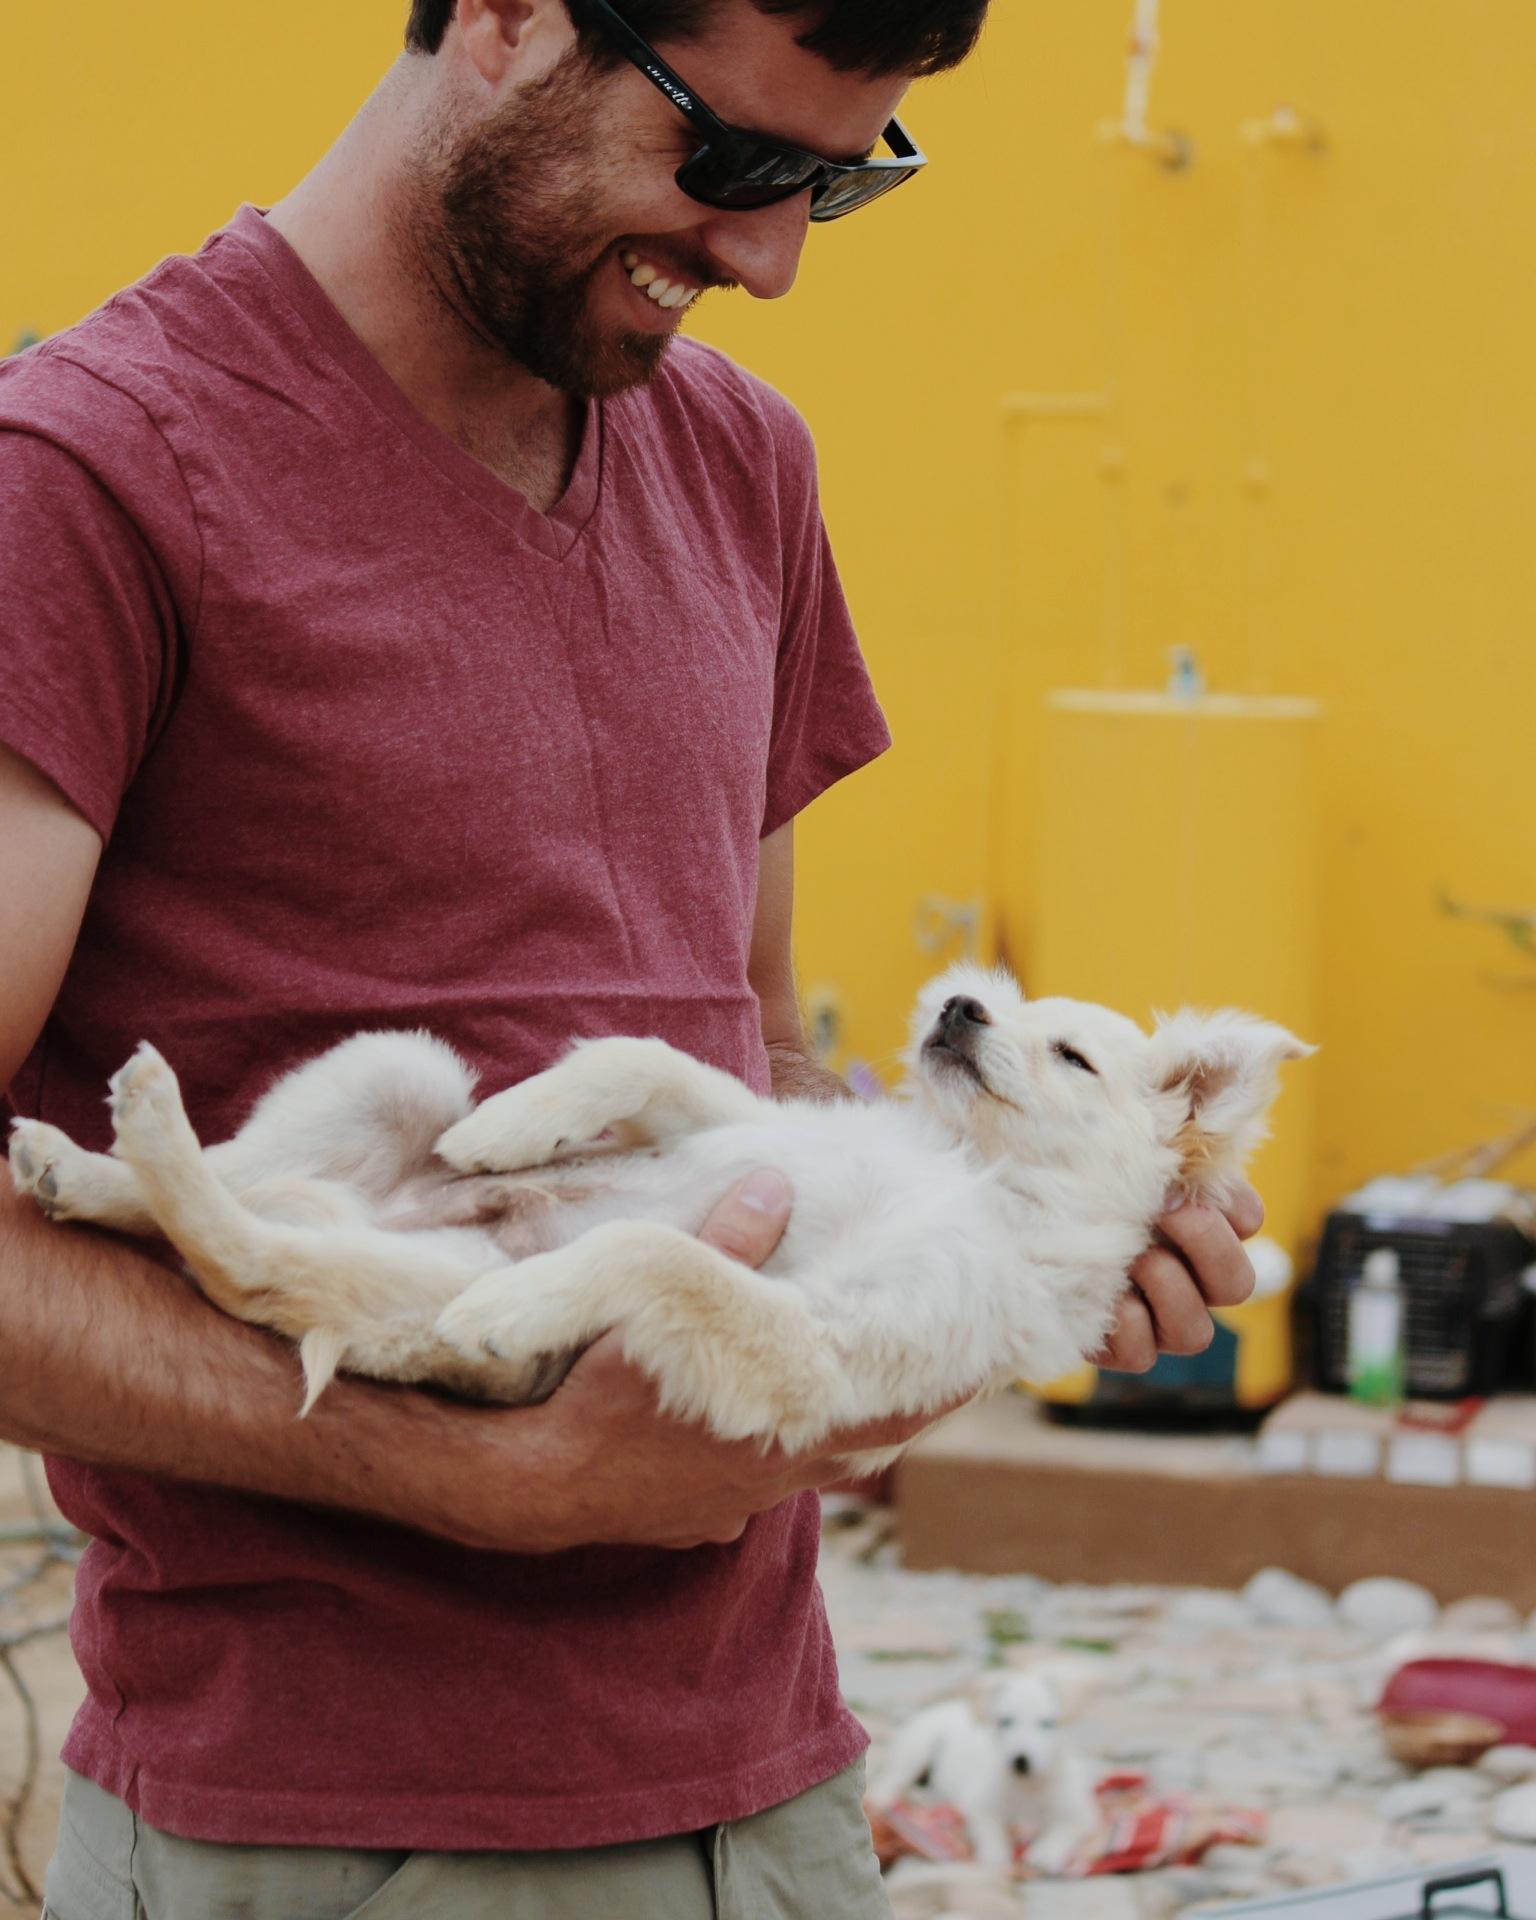 Ok, more Cameron + puppy pics